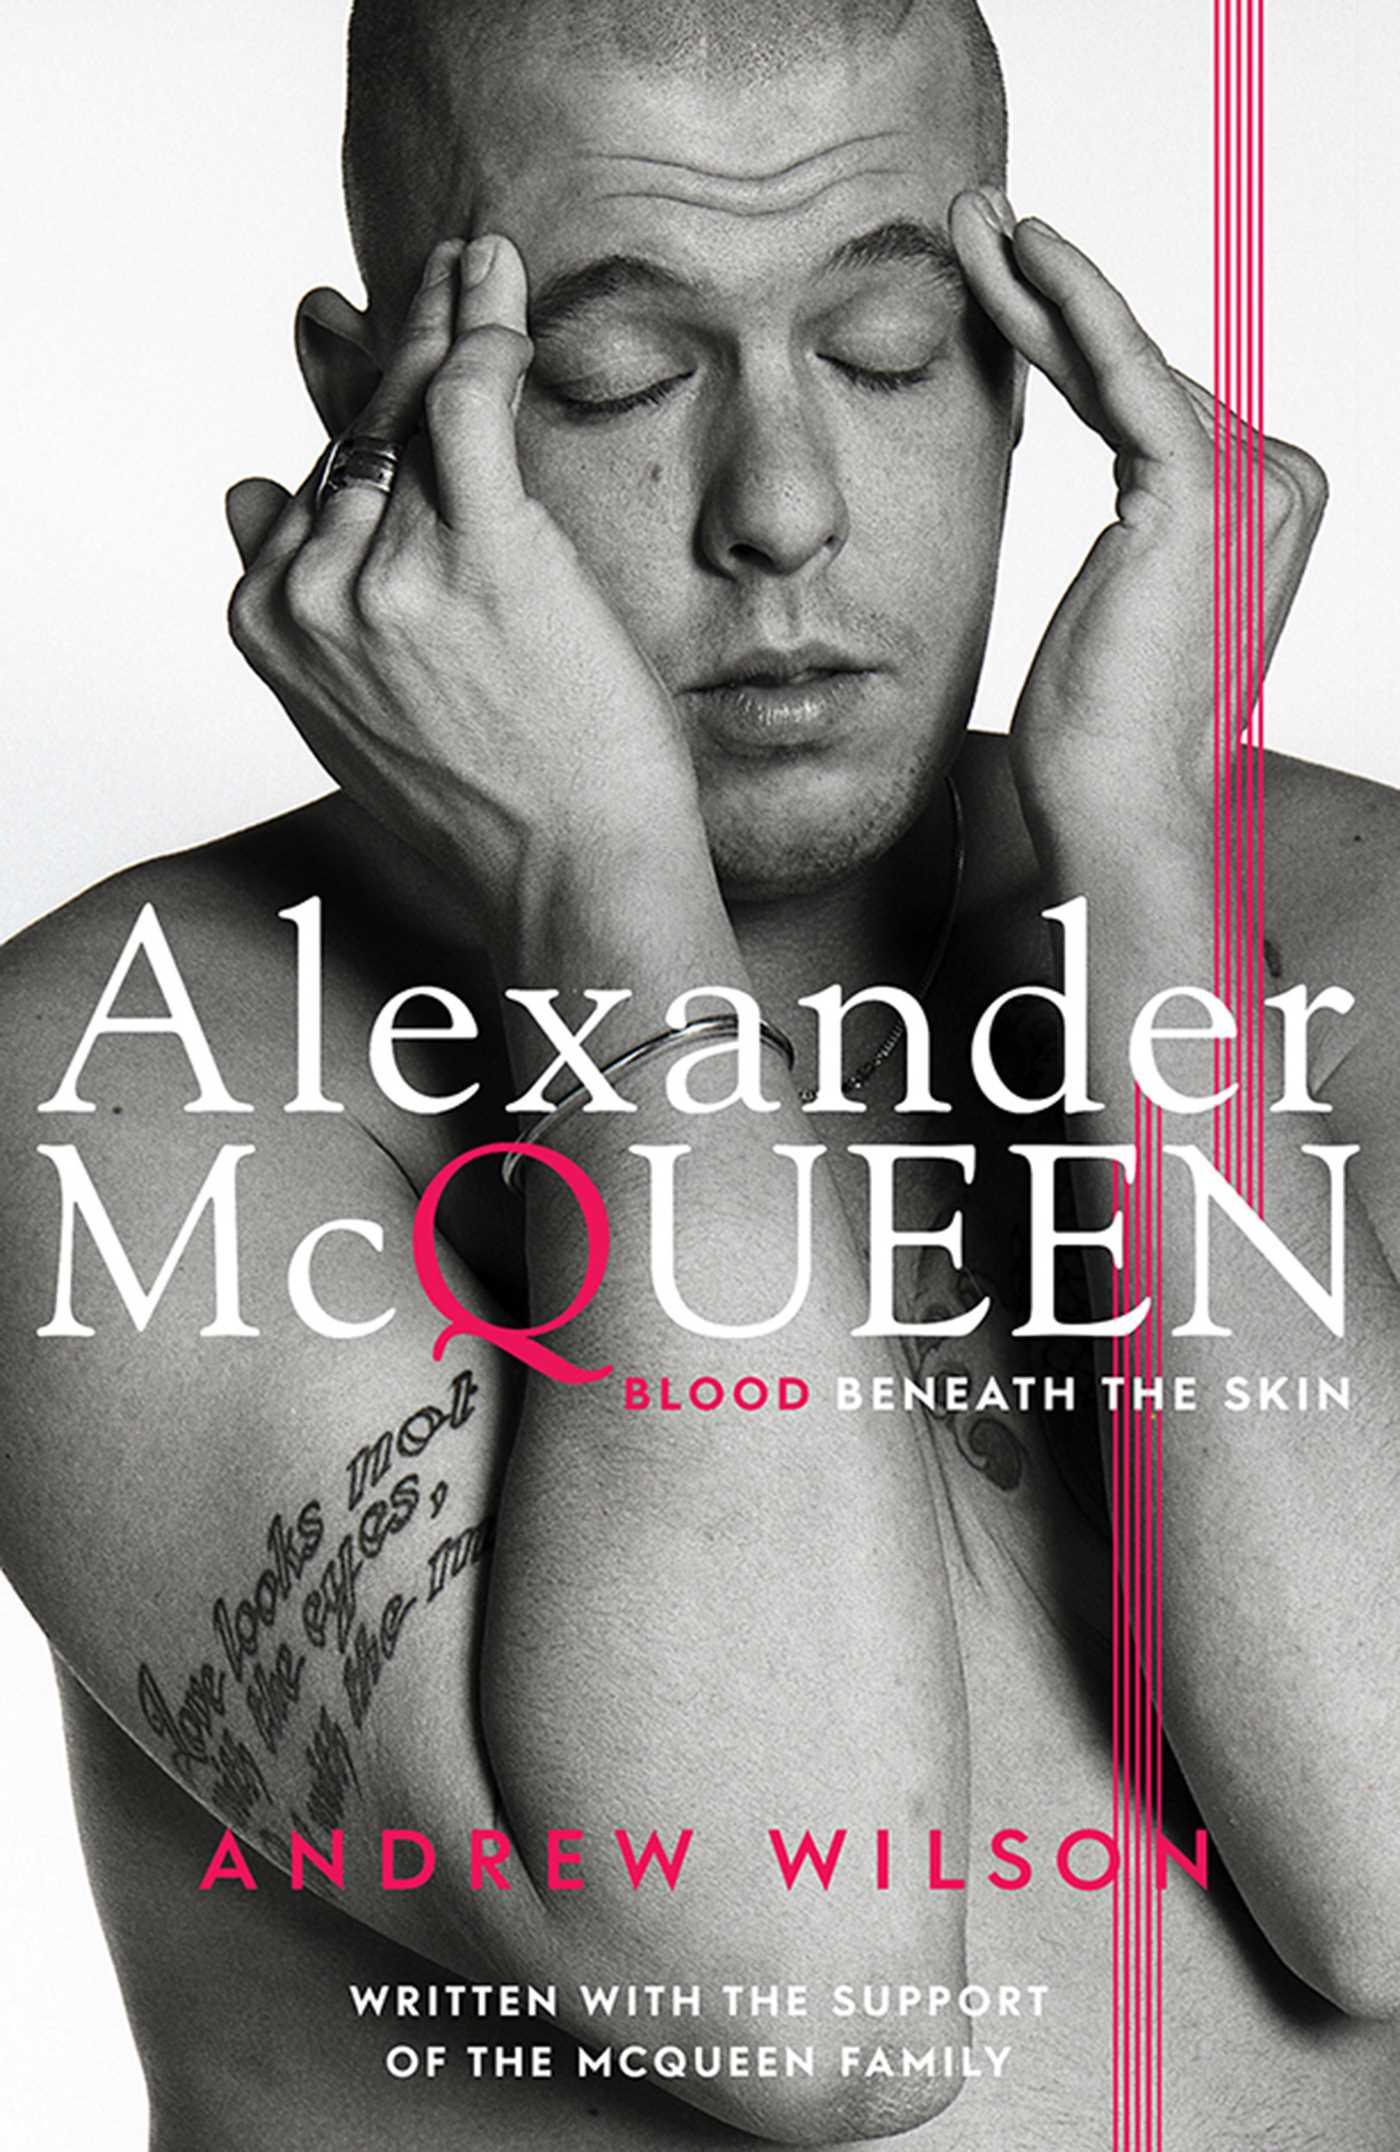 Image result for alexander mcqueen